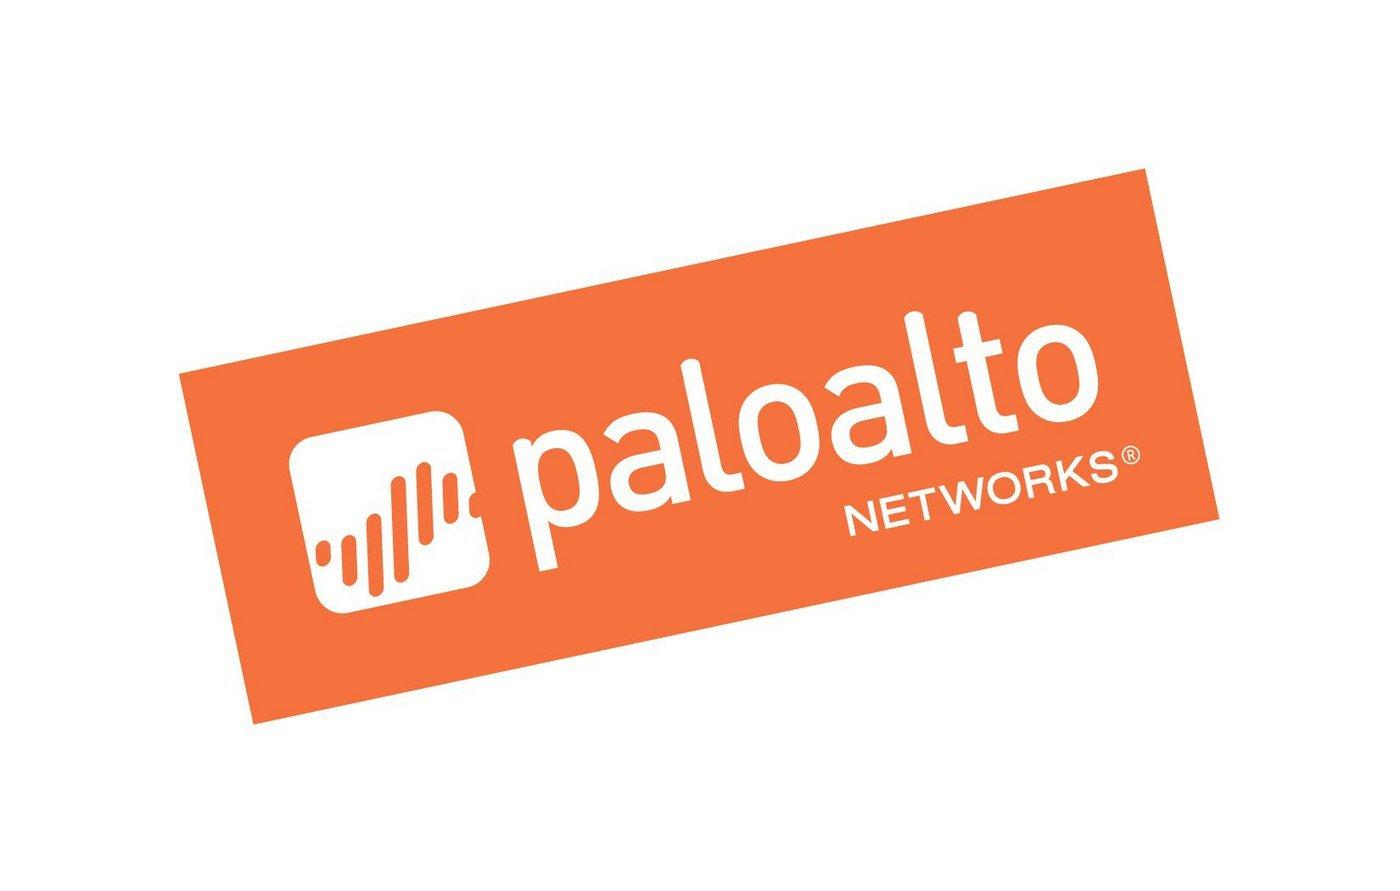 paloatlo-logo-badge-orange-dark-kick-up